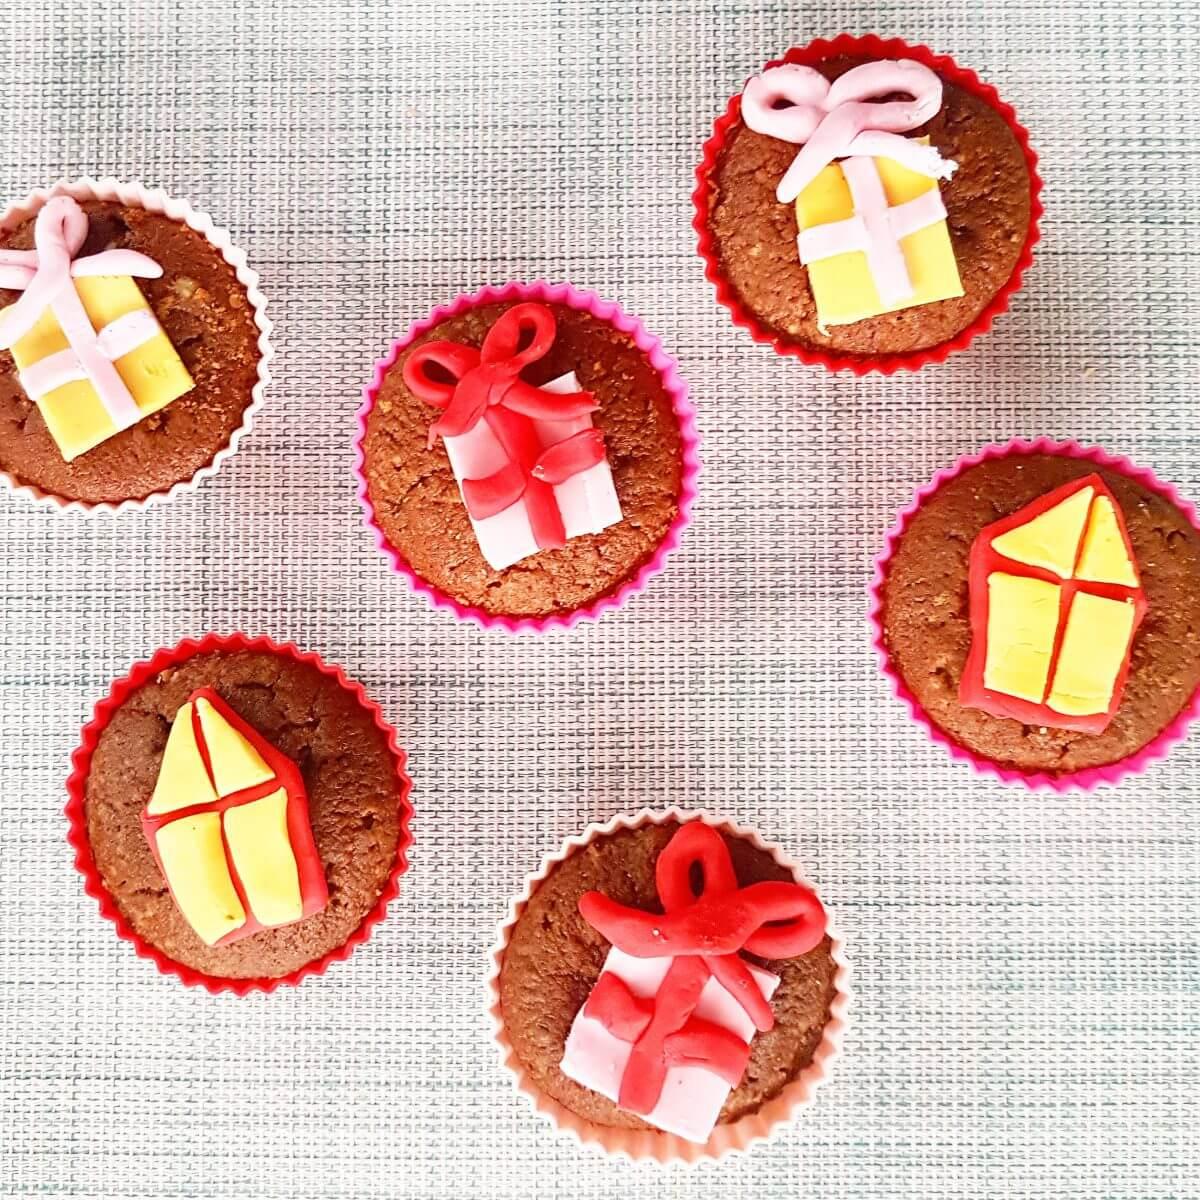 speculaas-cupcakes